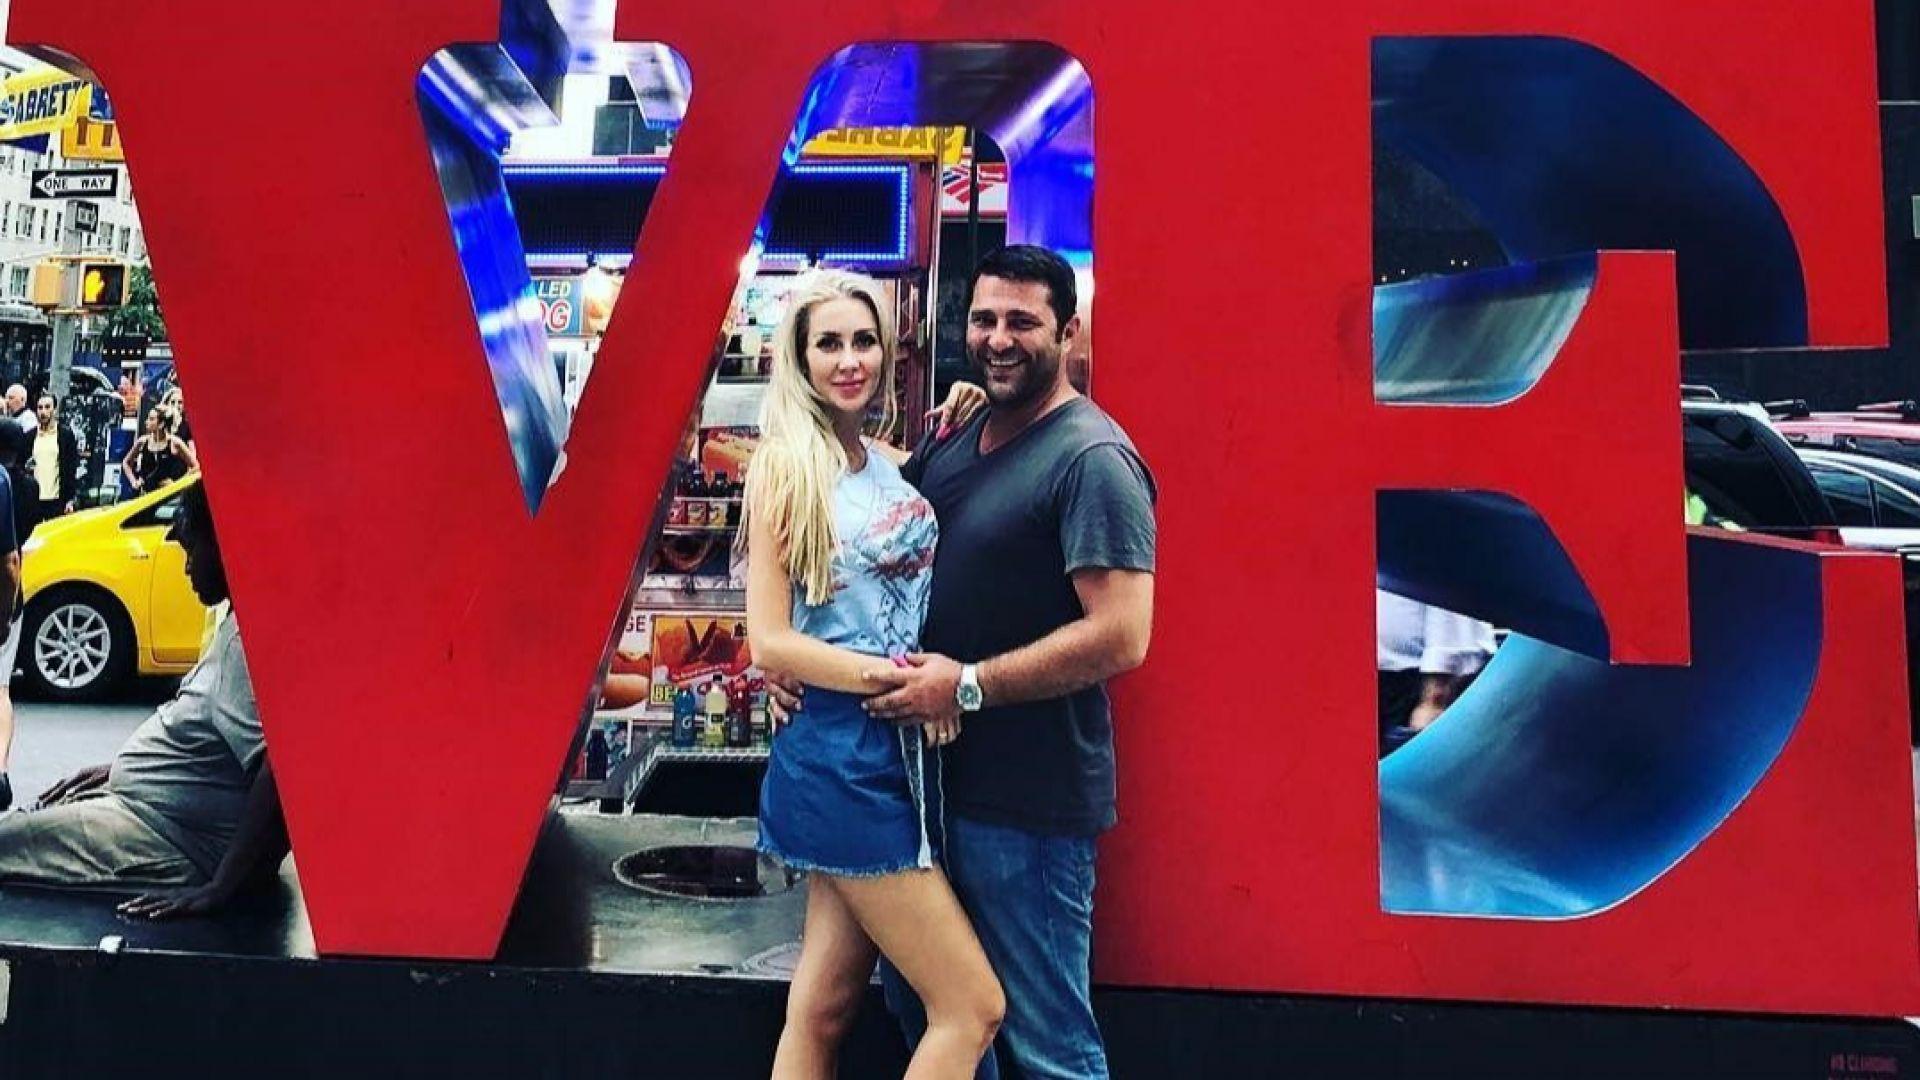 Антония и Ивайло пренесоха медения си месец в Ню Йорк